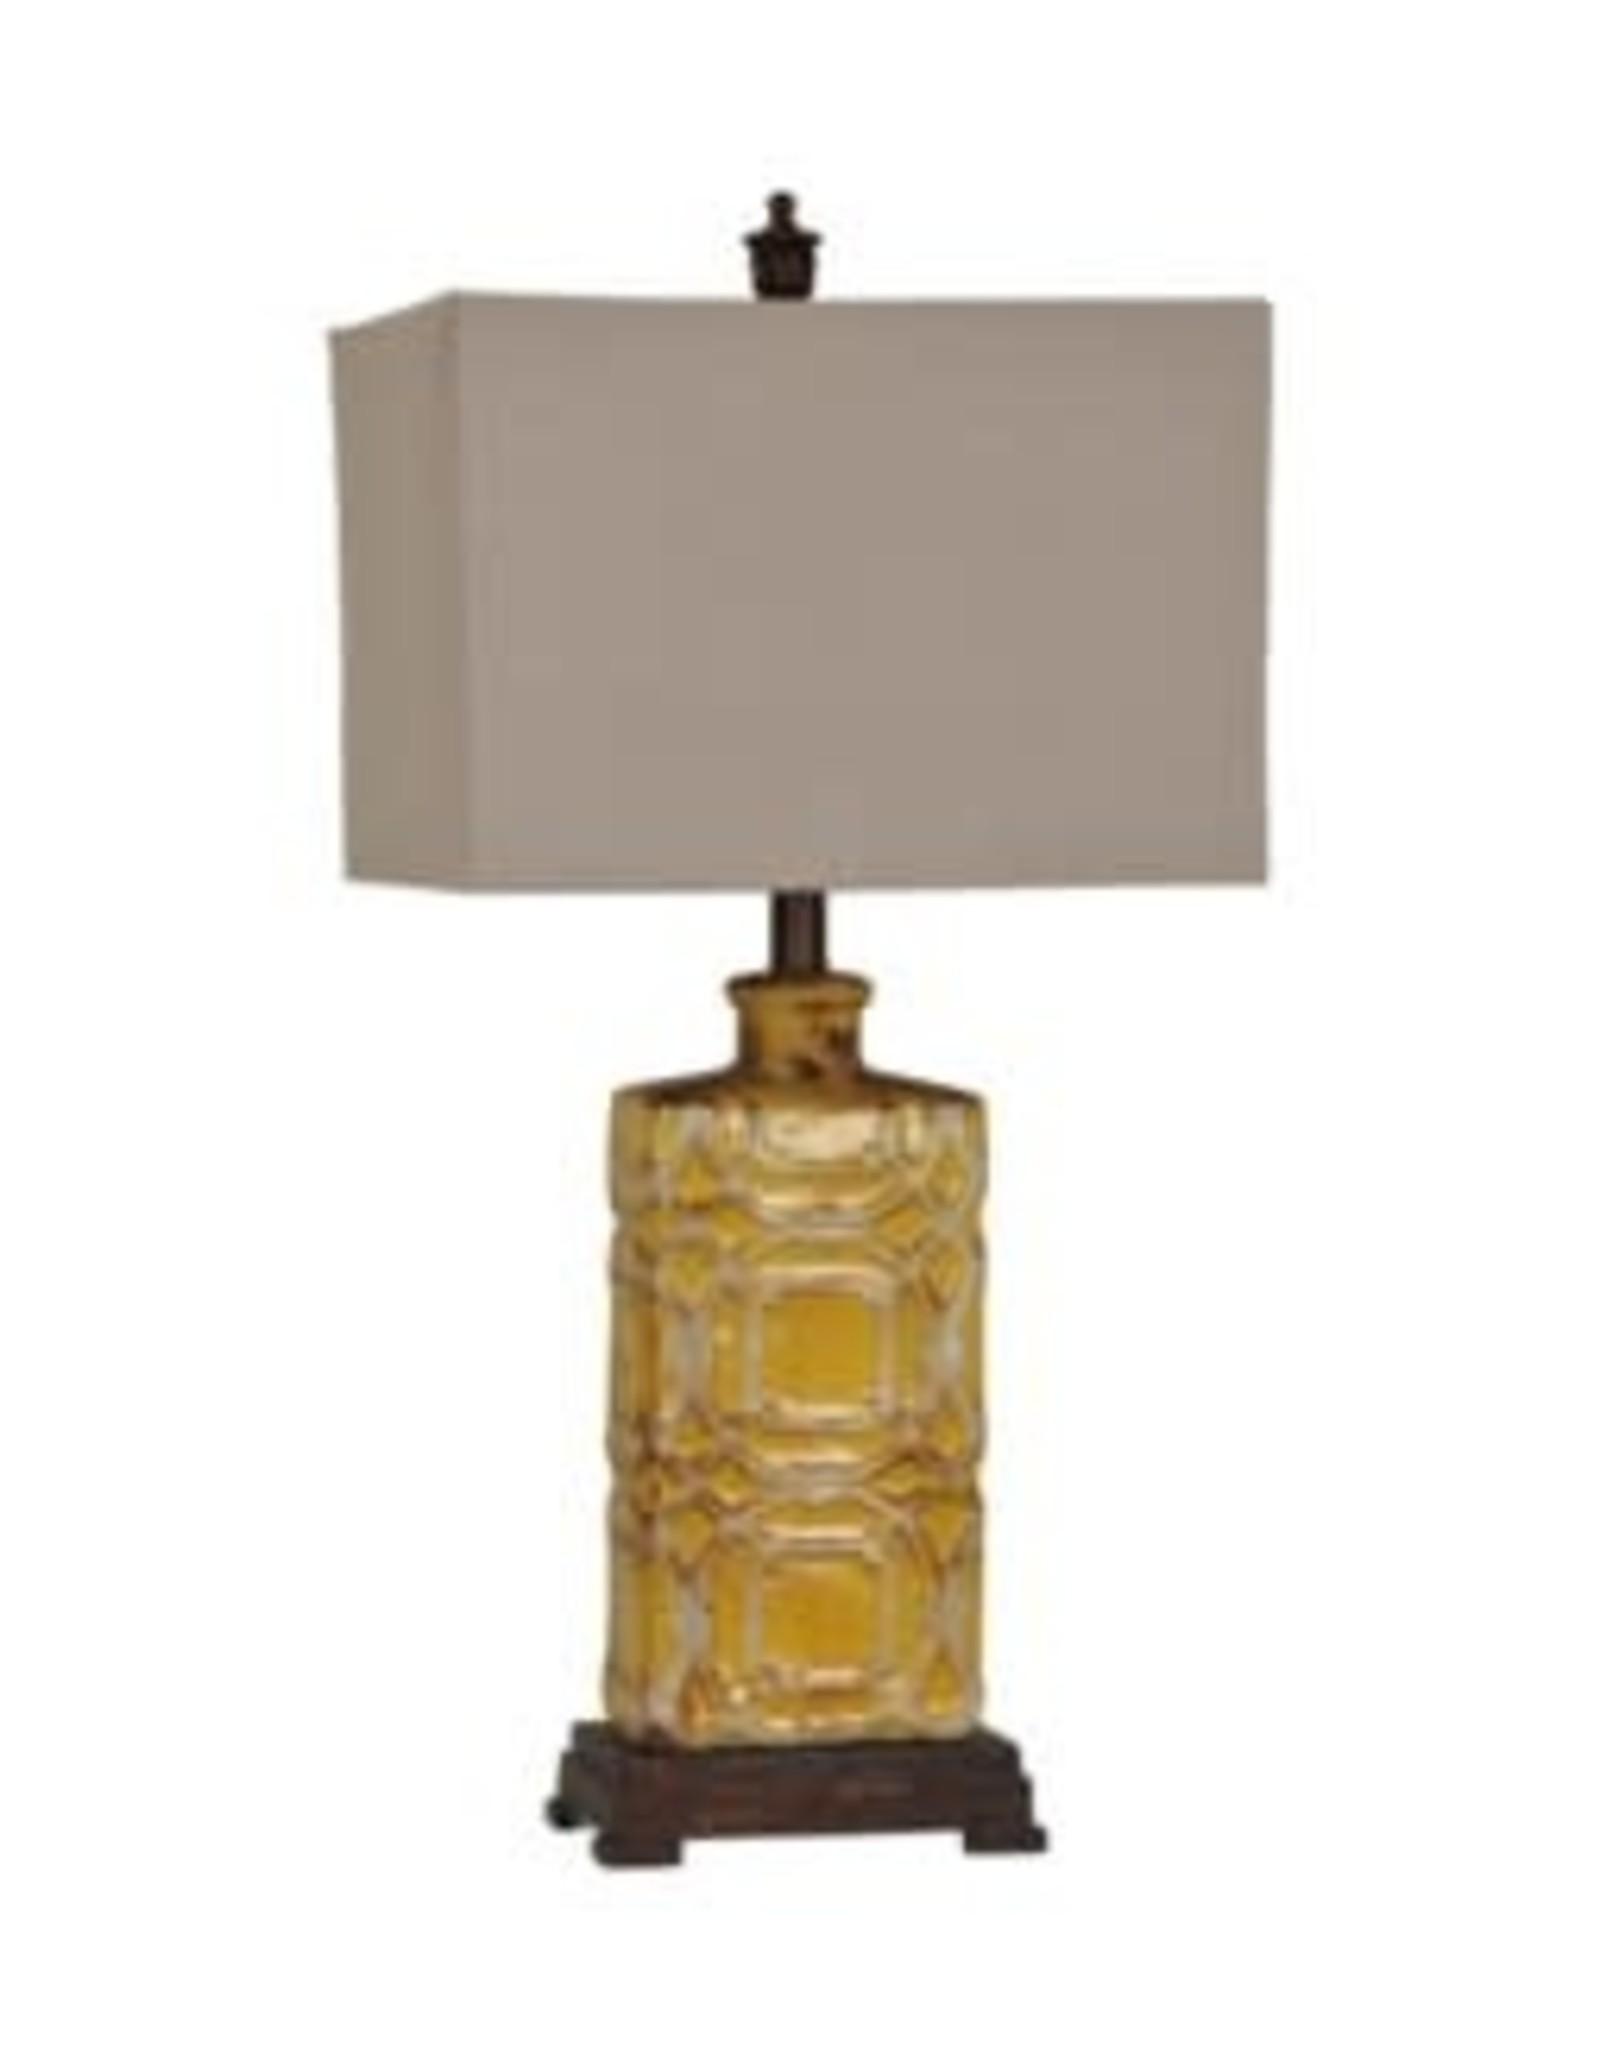 Crestview Chathem Table Lamp